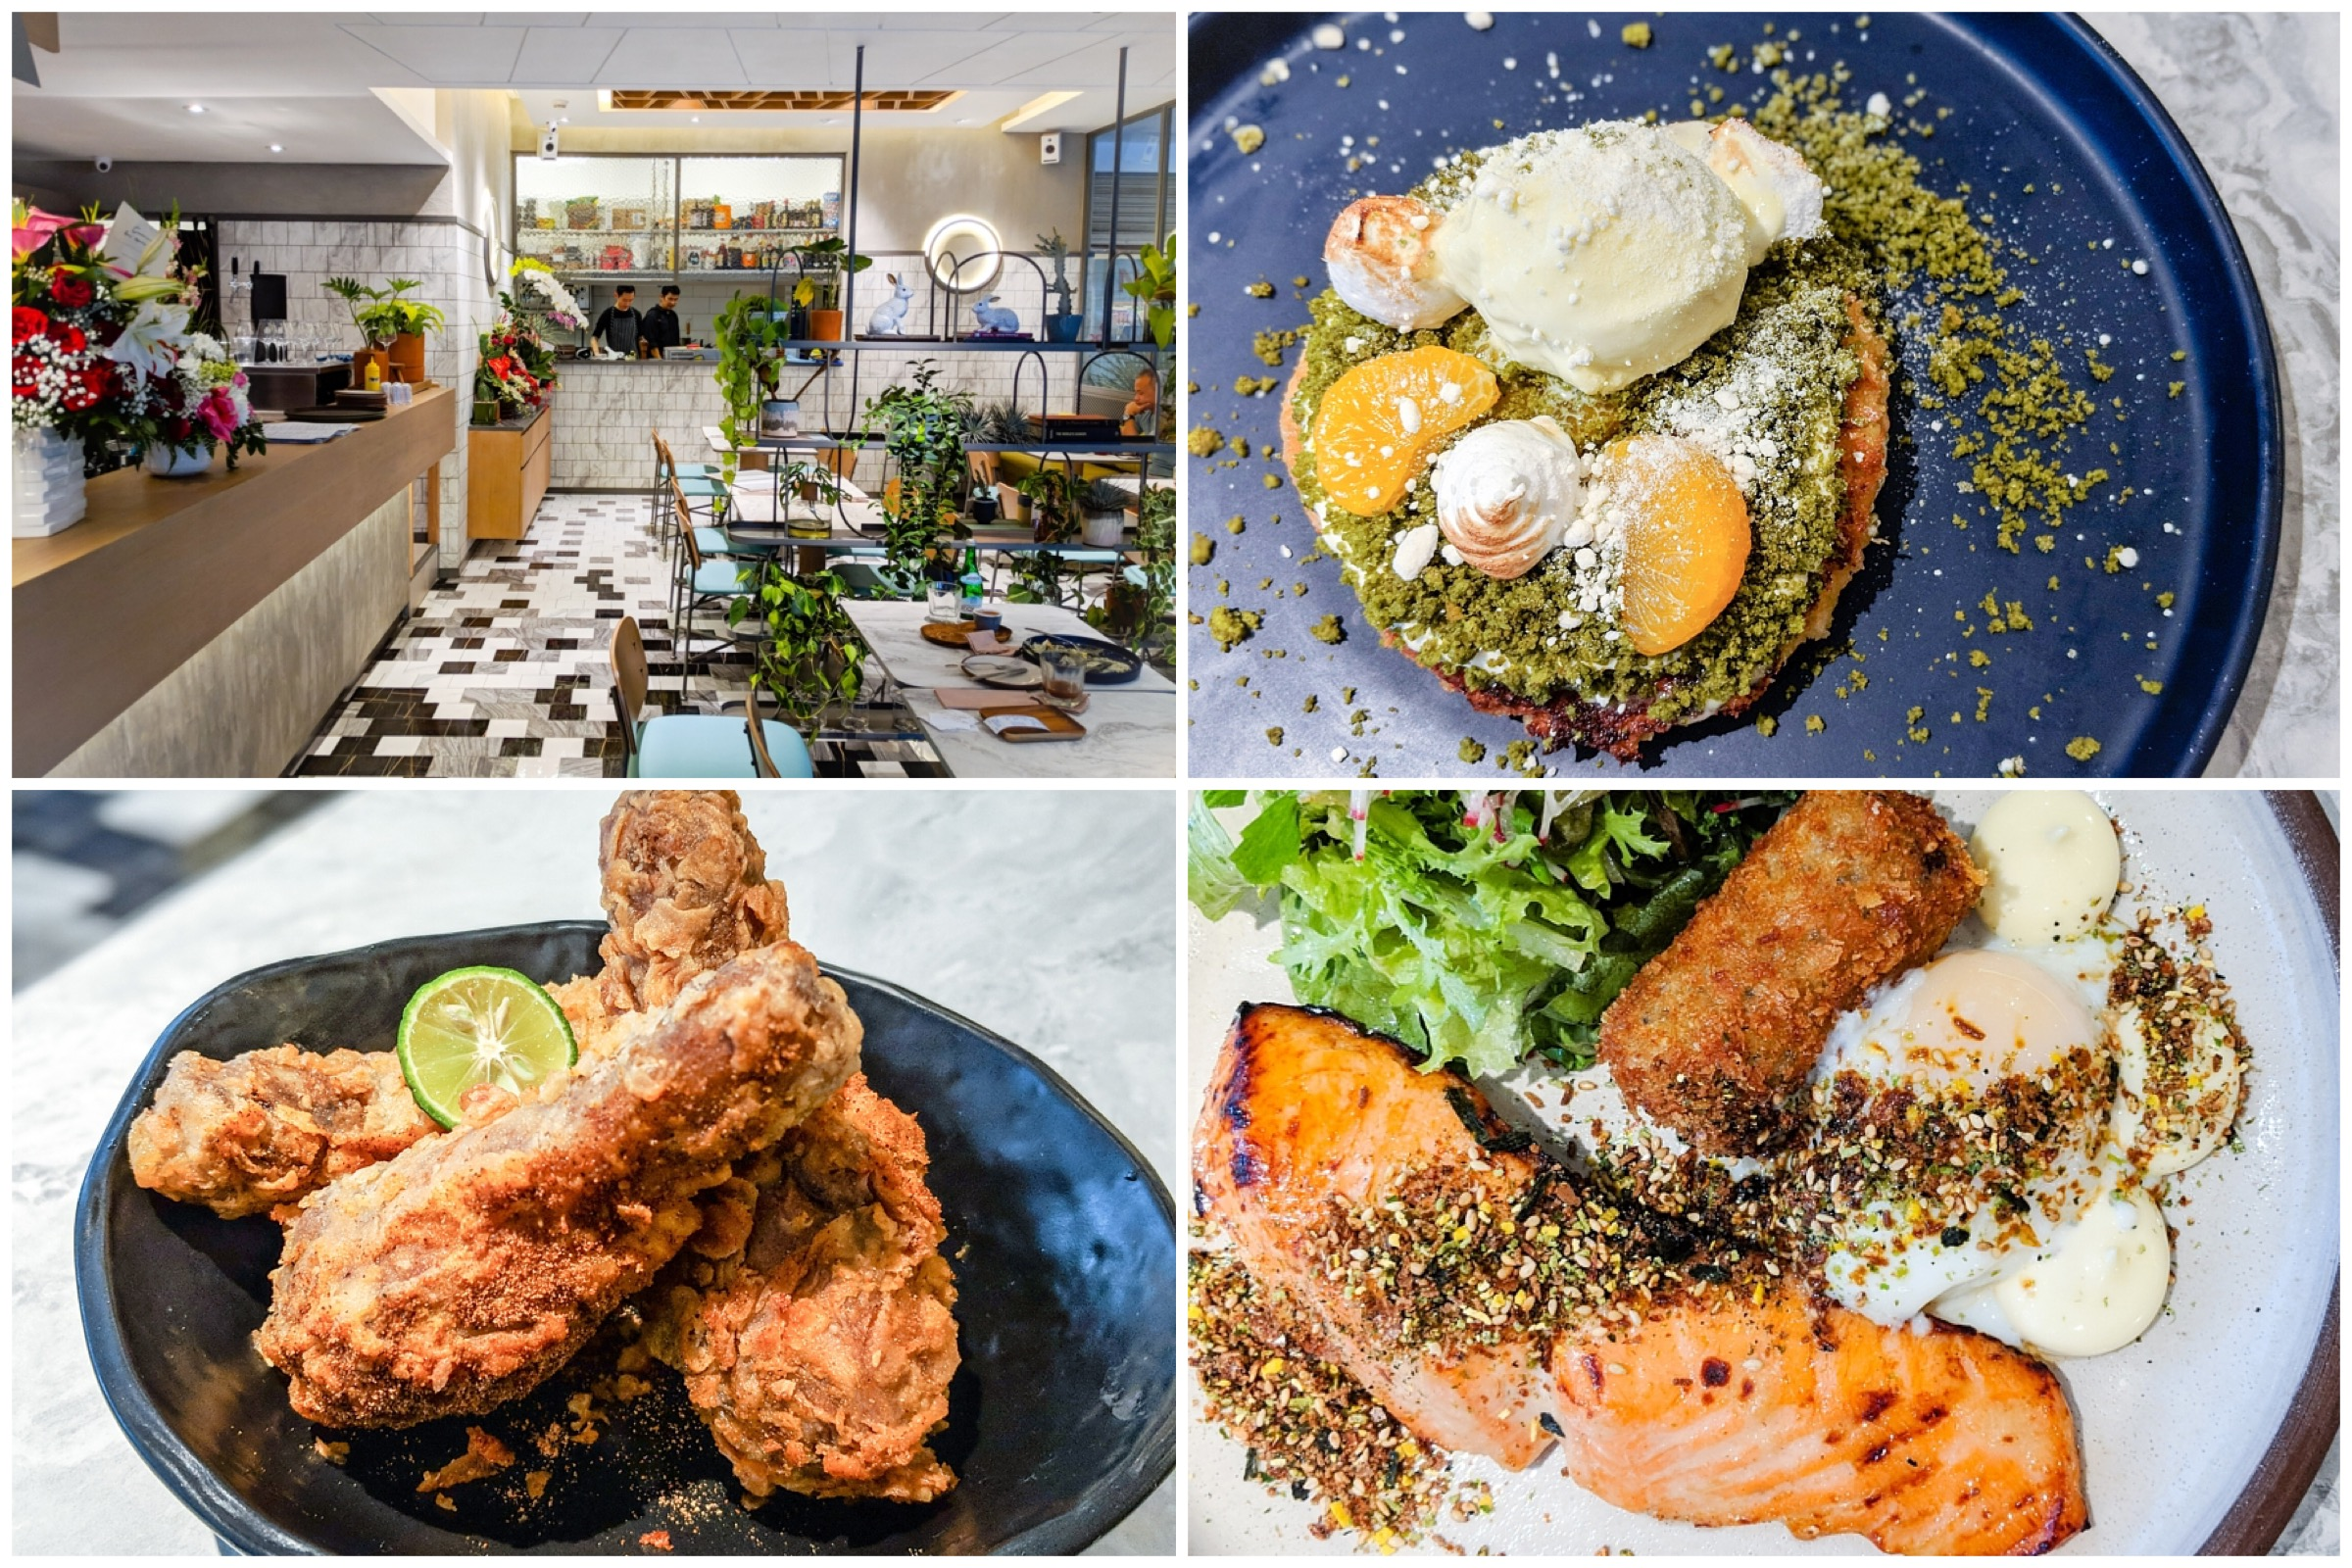 Devon Cafe Jakarta - Famed Sydney Cafe Arrives To Indonesia With Impressive Brunch Items, At Crystal Lagoon Senayan City